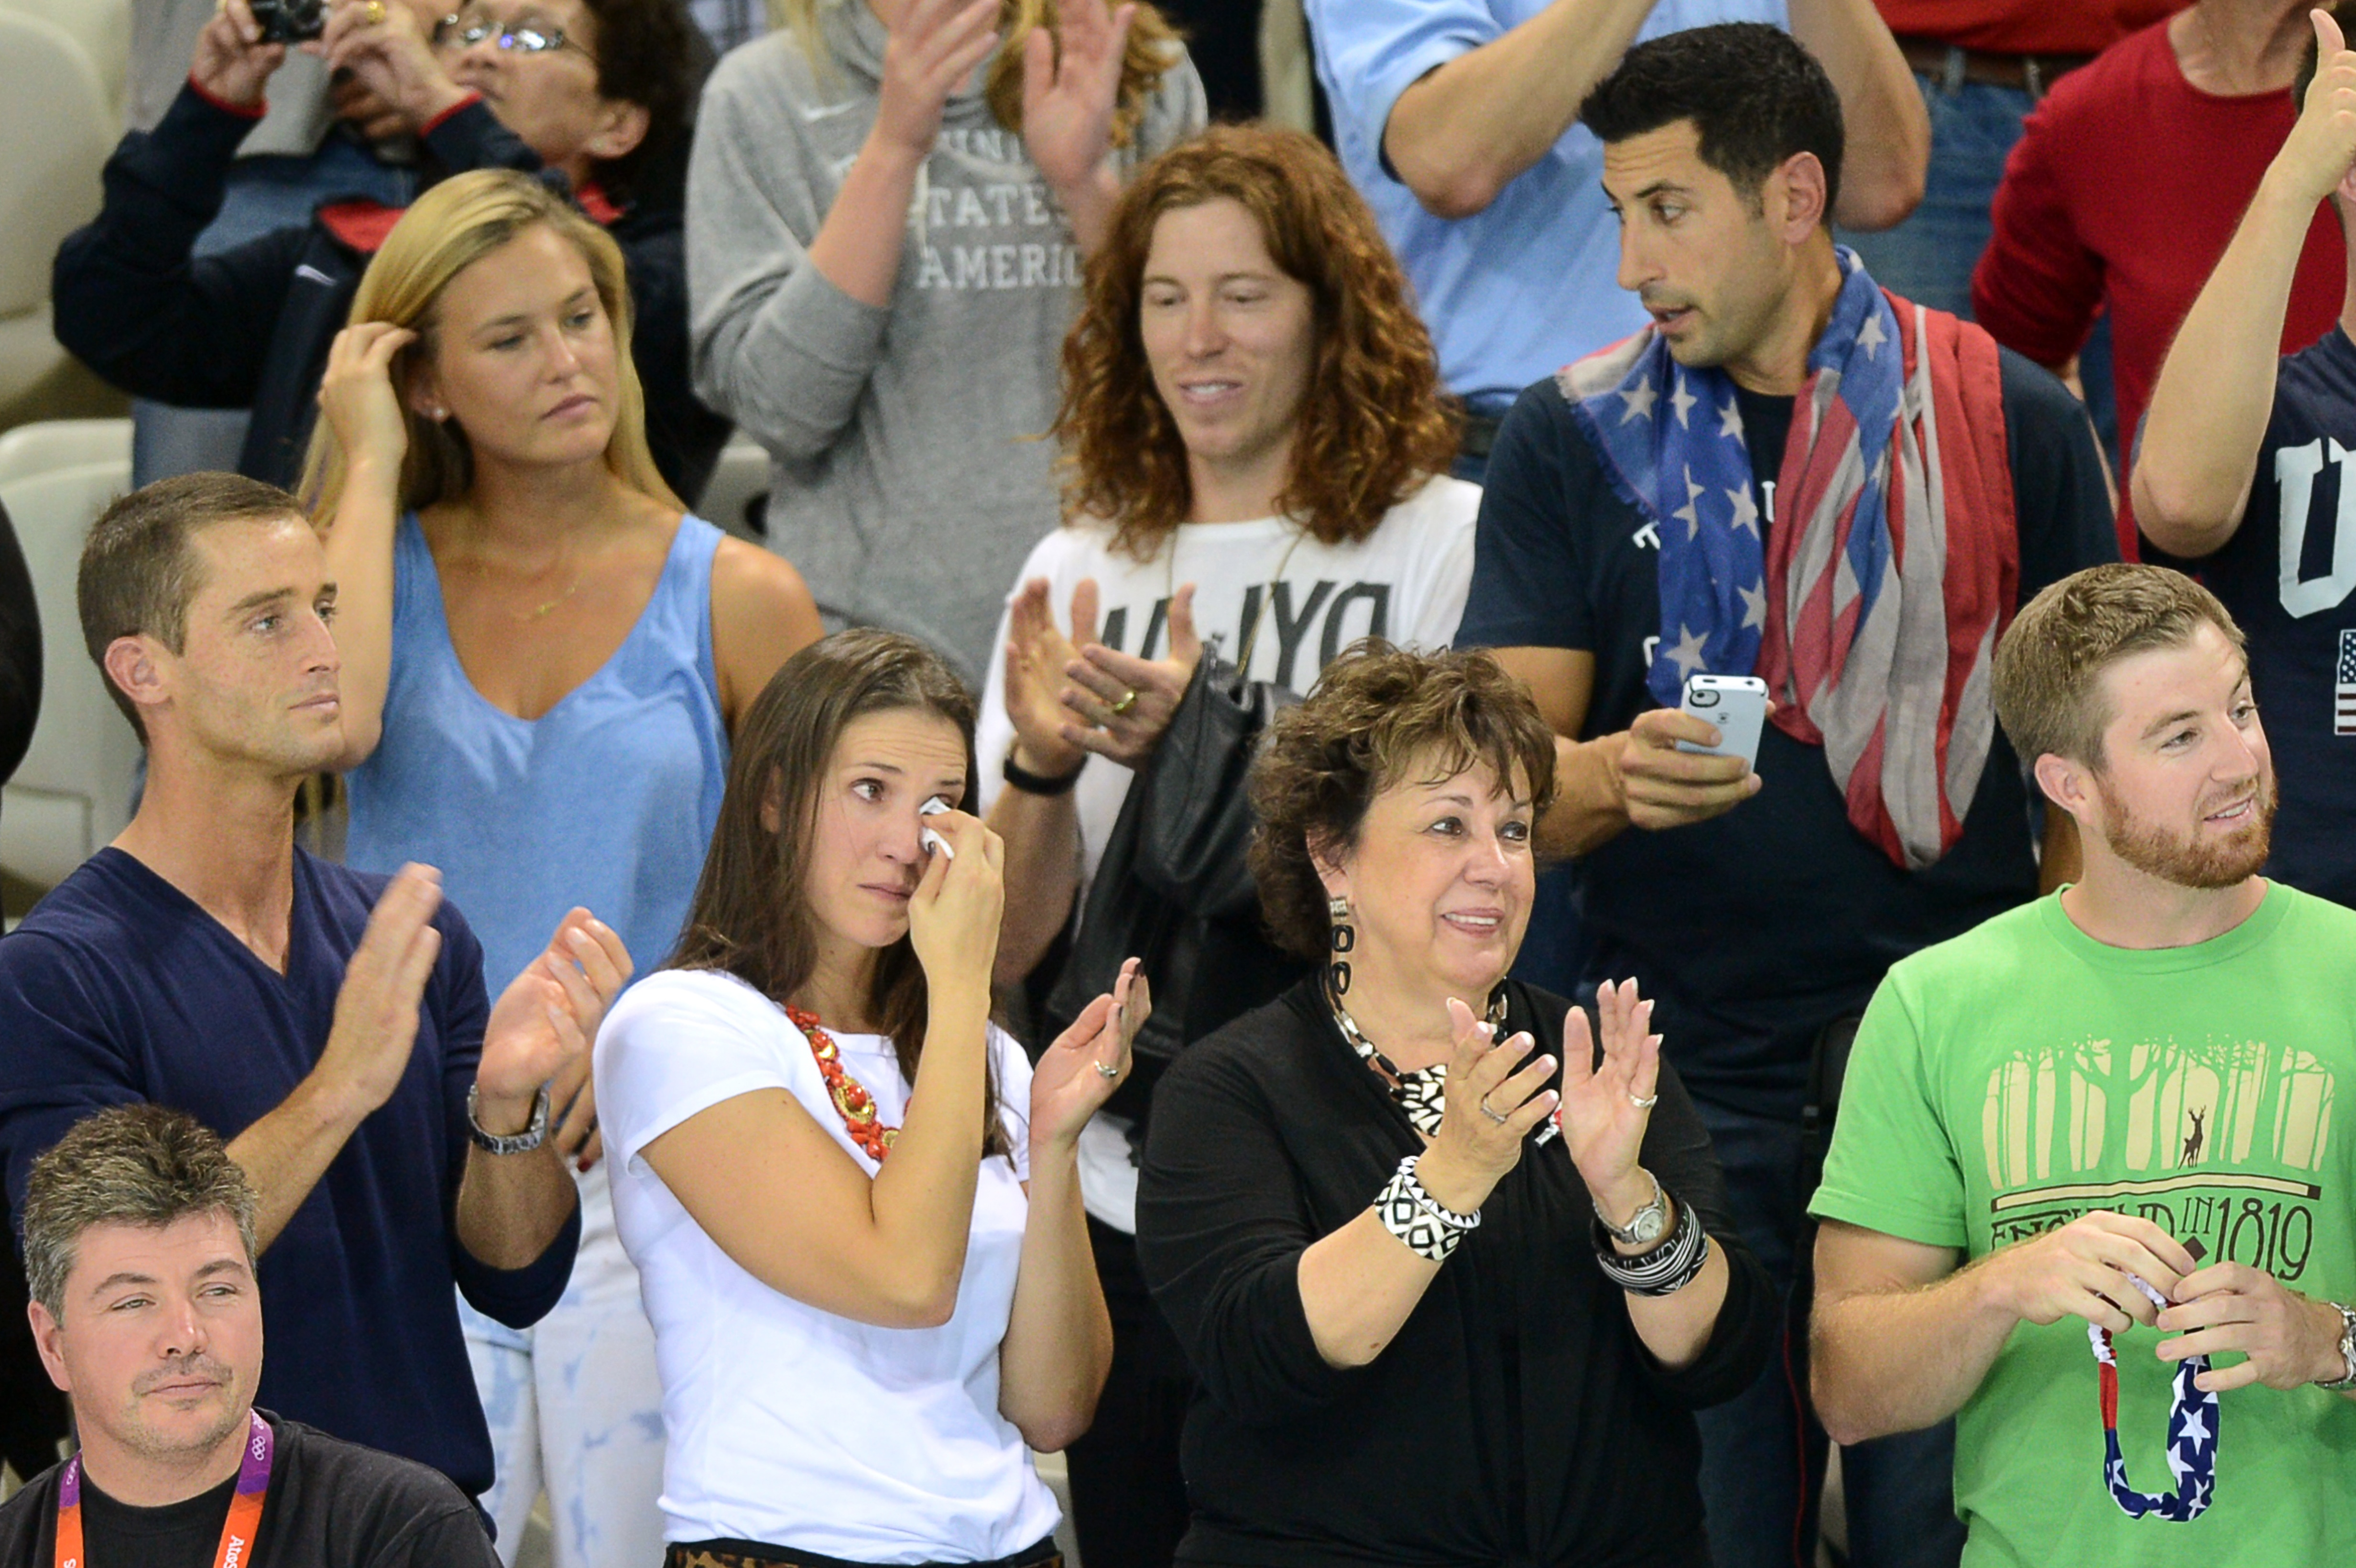 Bar Refaeli and Shaun White Cheer On Michael Phelps to Victory